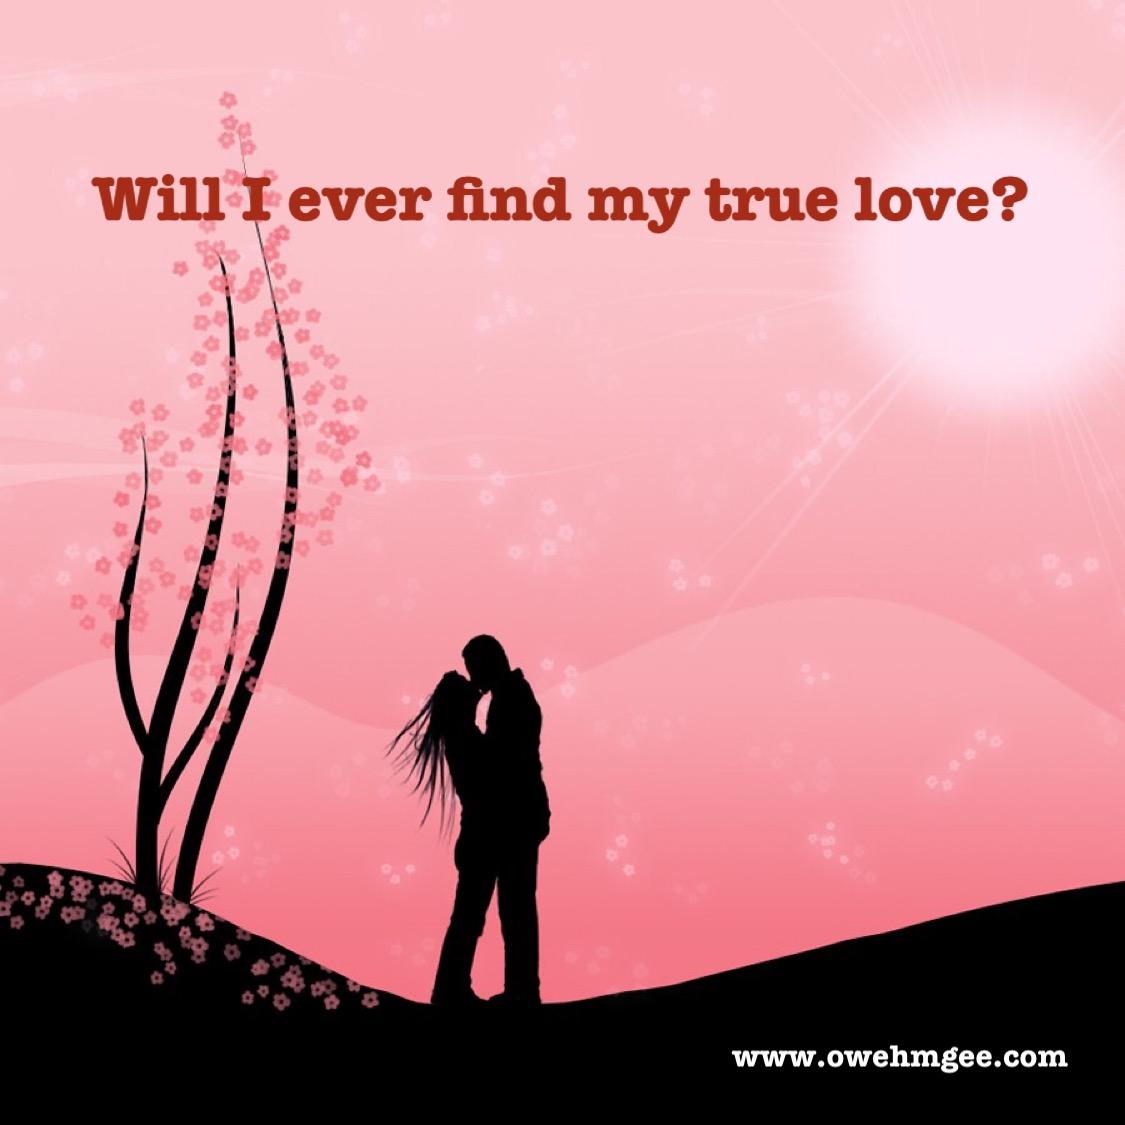 Will I Ever Find My True Love?